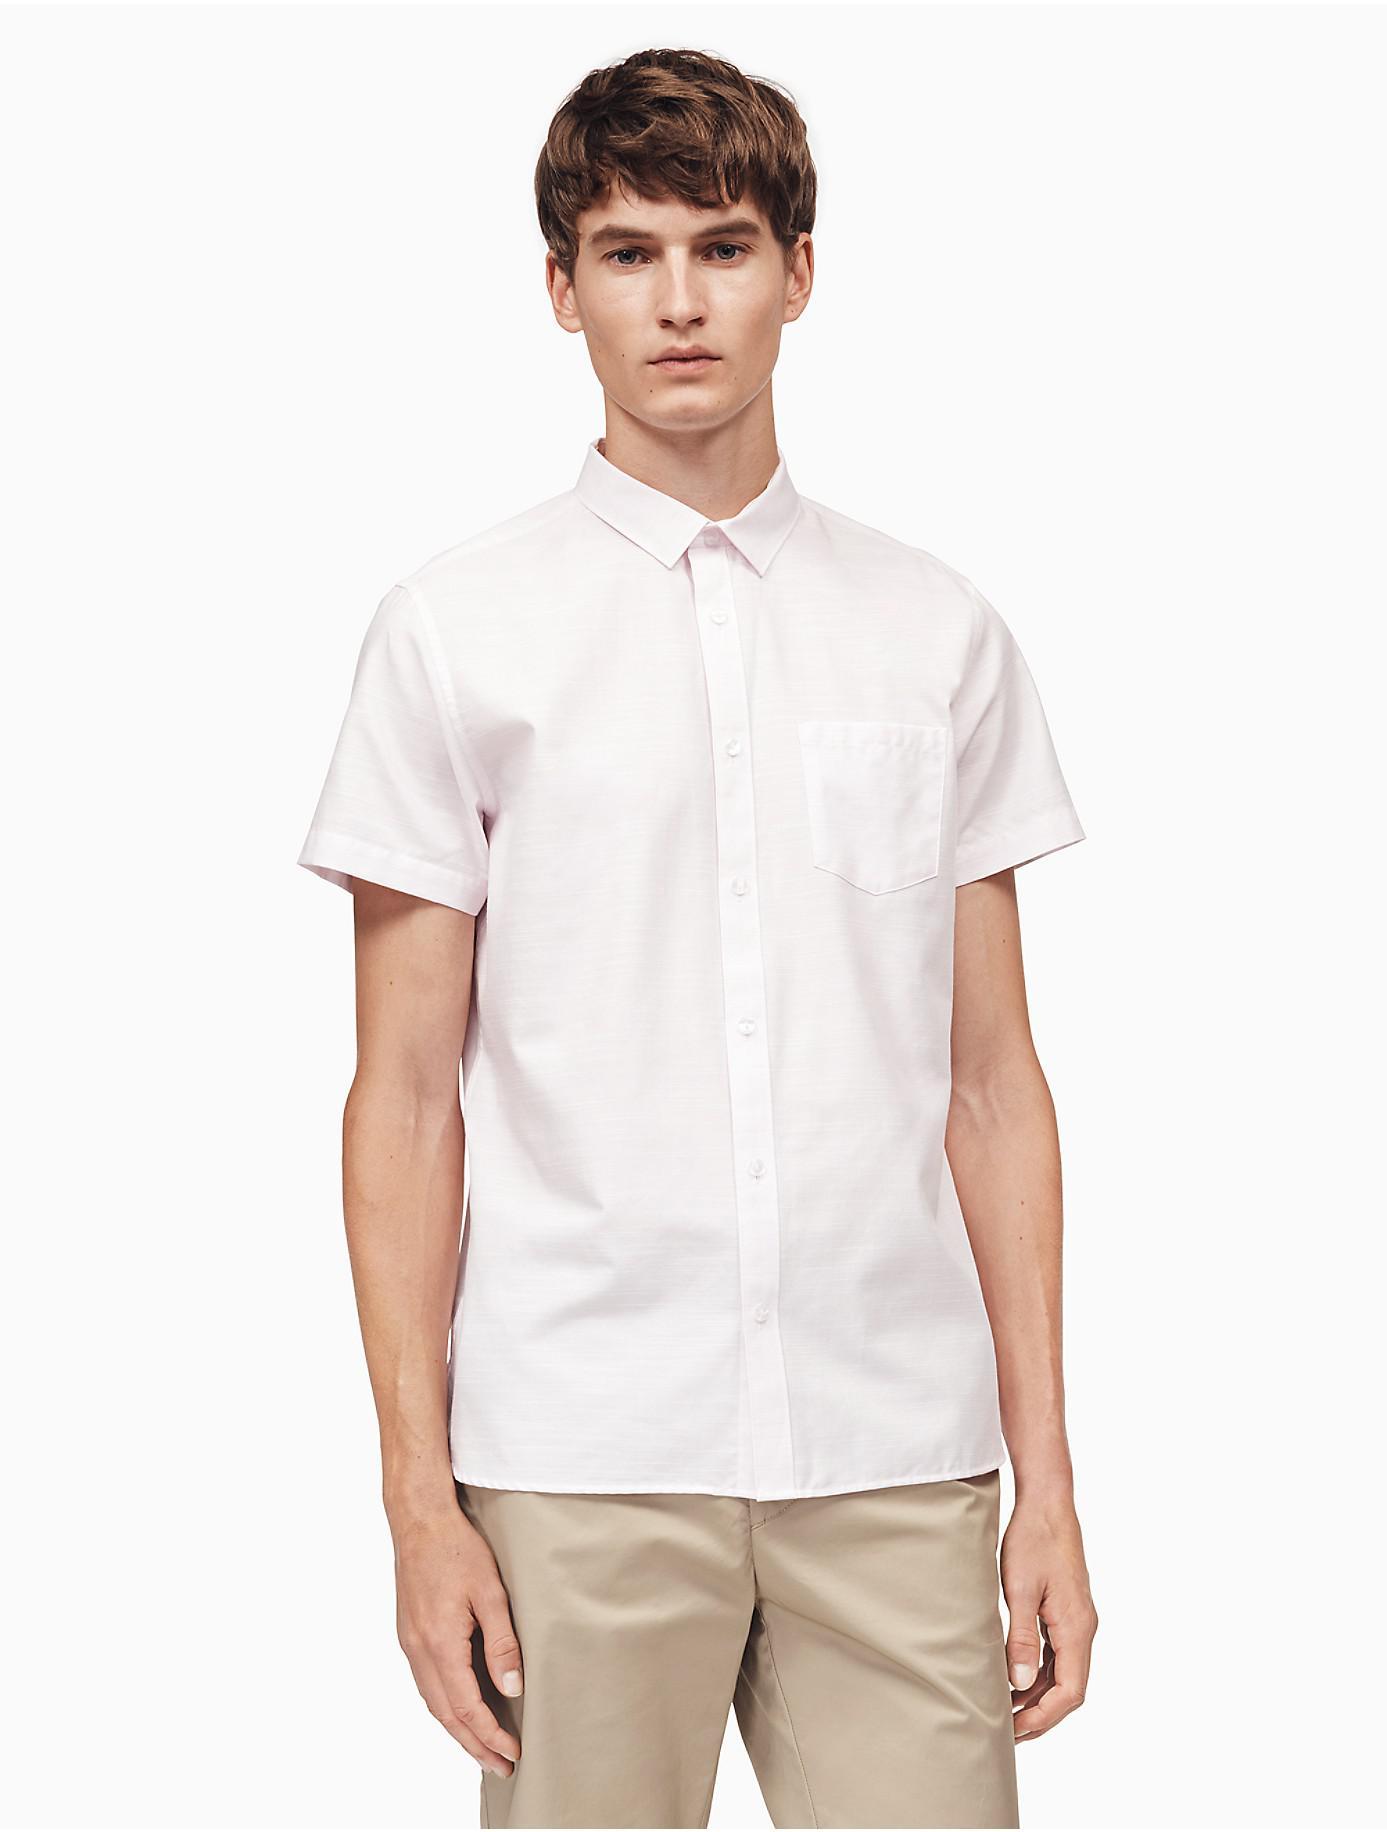 3c8d6a75fbb Lyst - Calvin Klein Classic Fit Cotton Slub Shirt in White for Men ...